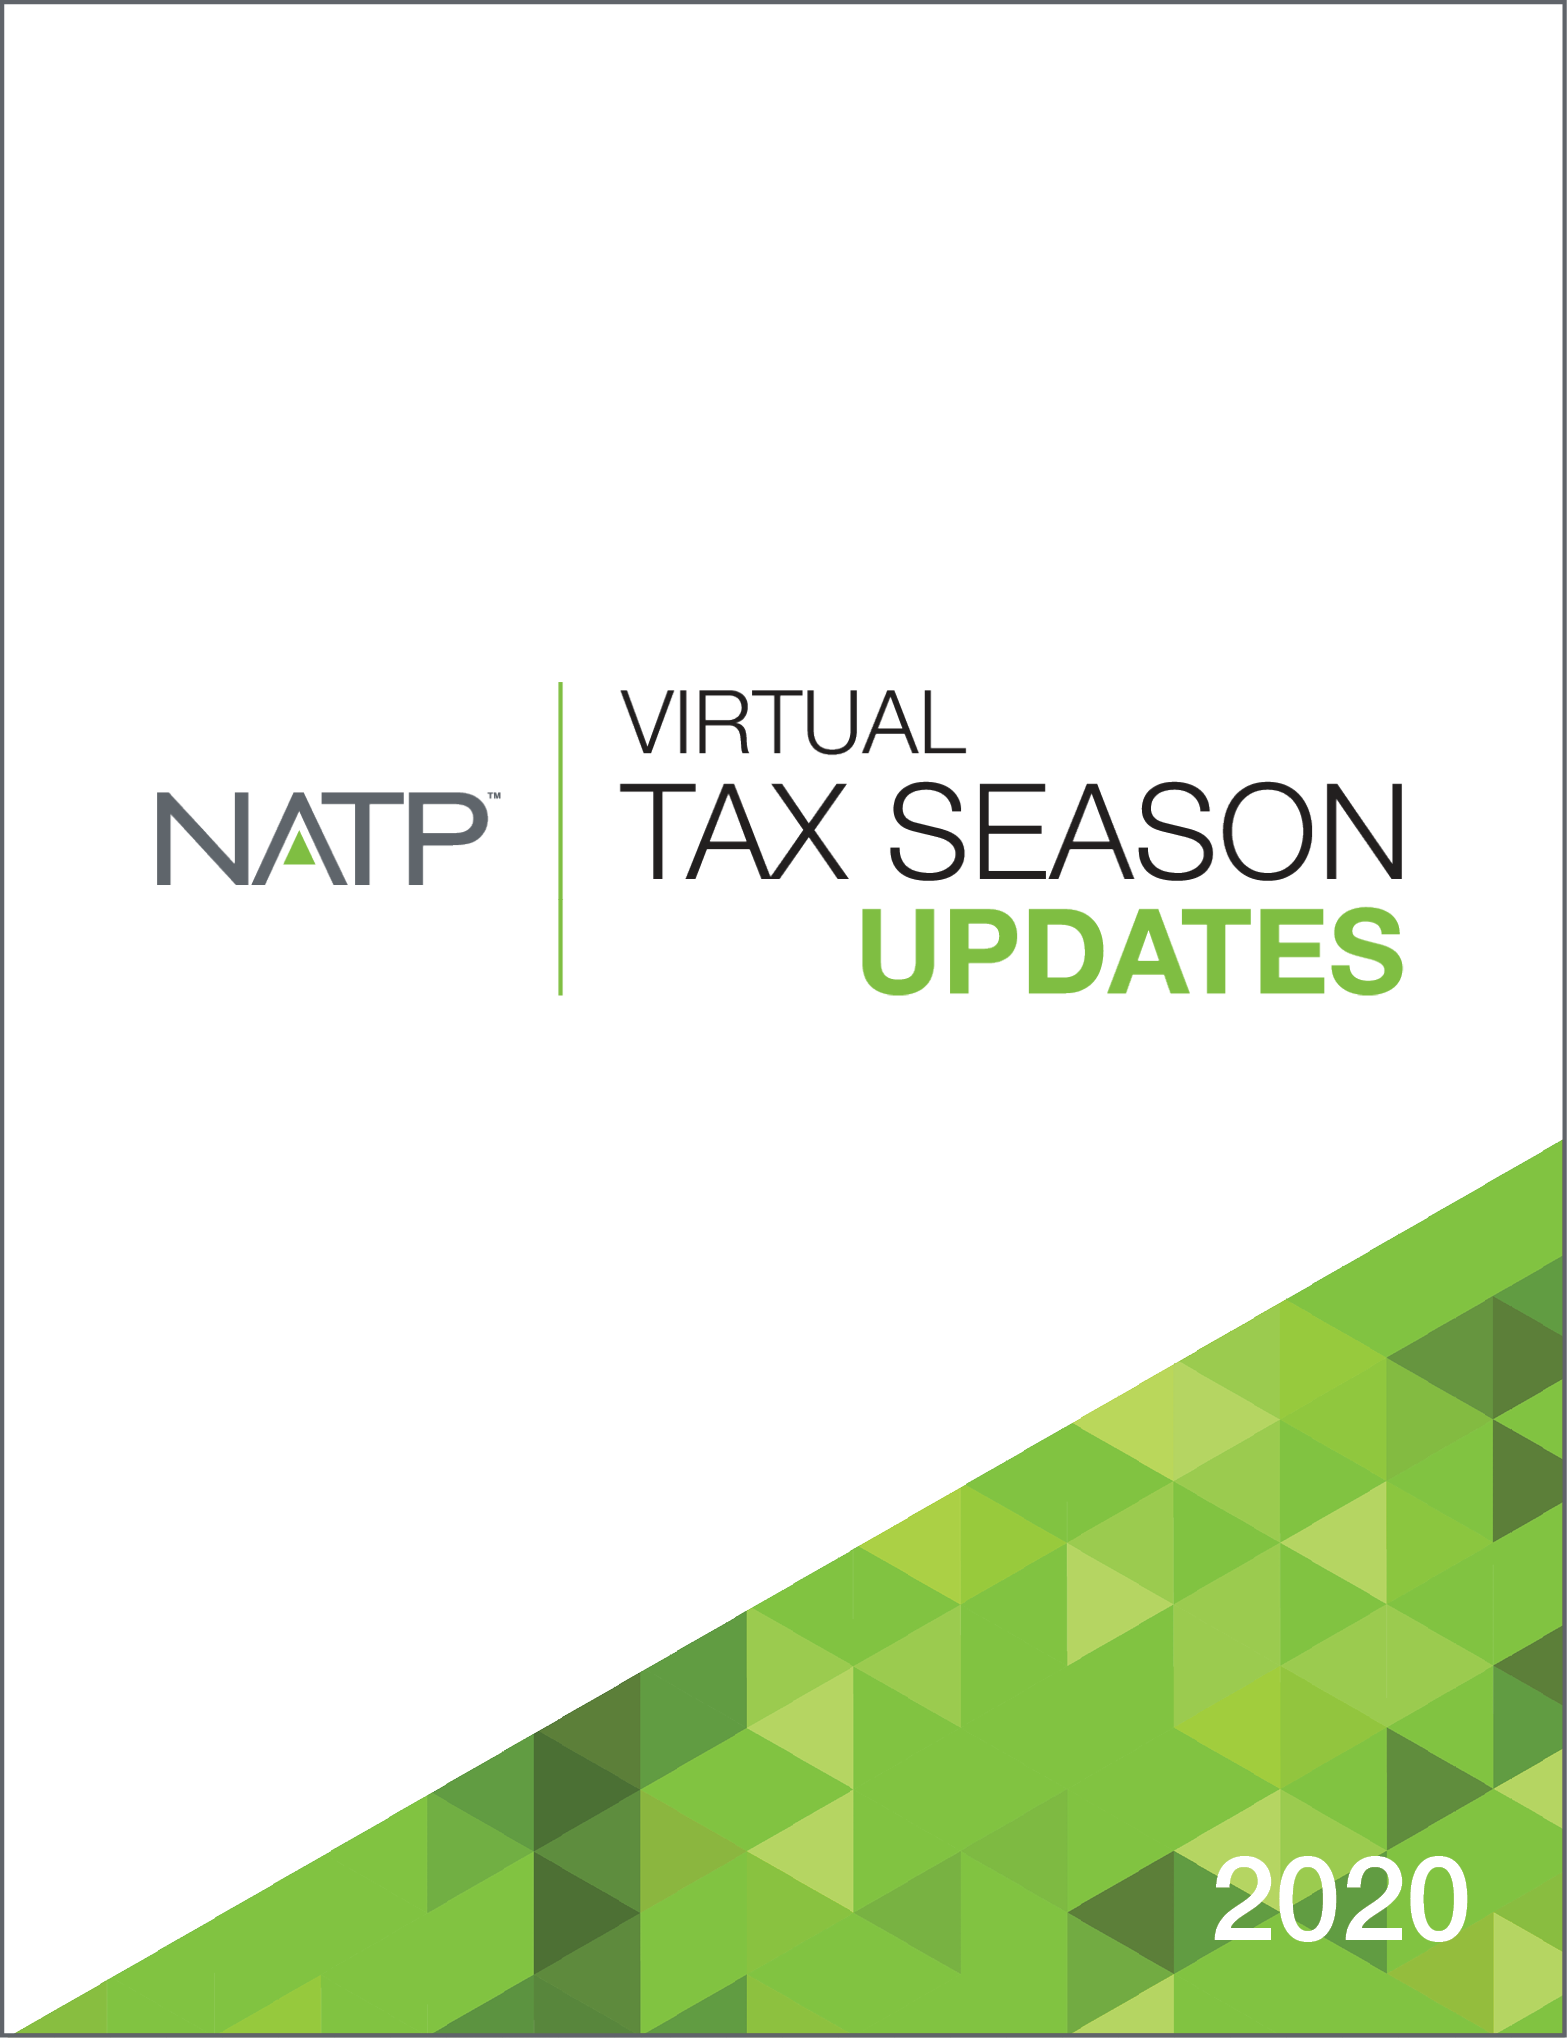 Virtual Tax Season Updates Textbook (2020) - #20339